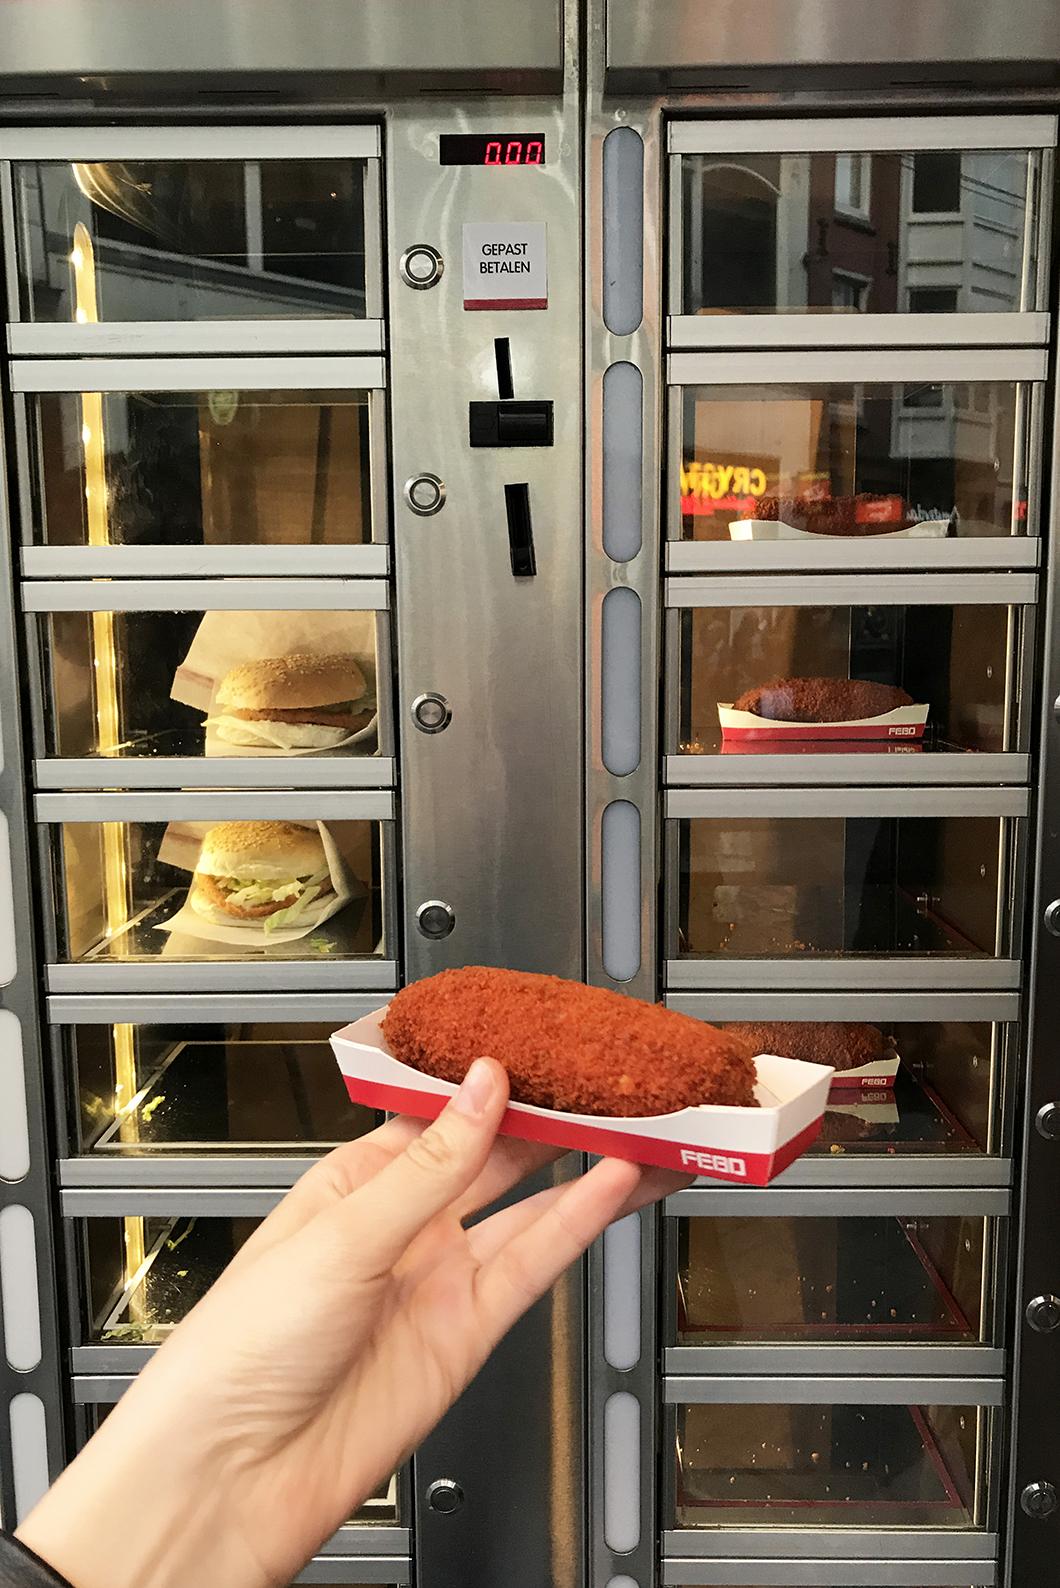 FEBO - street food Amsterdam